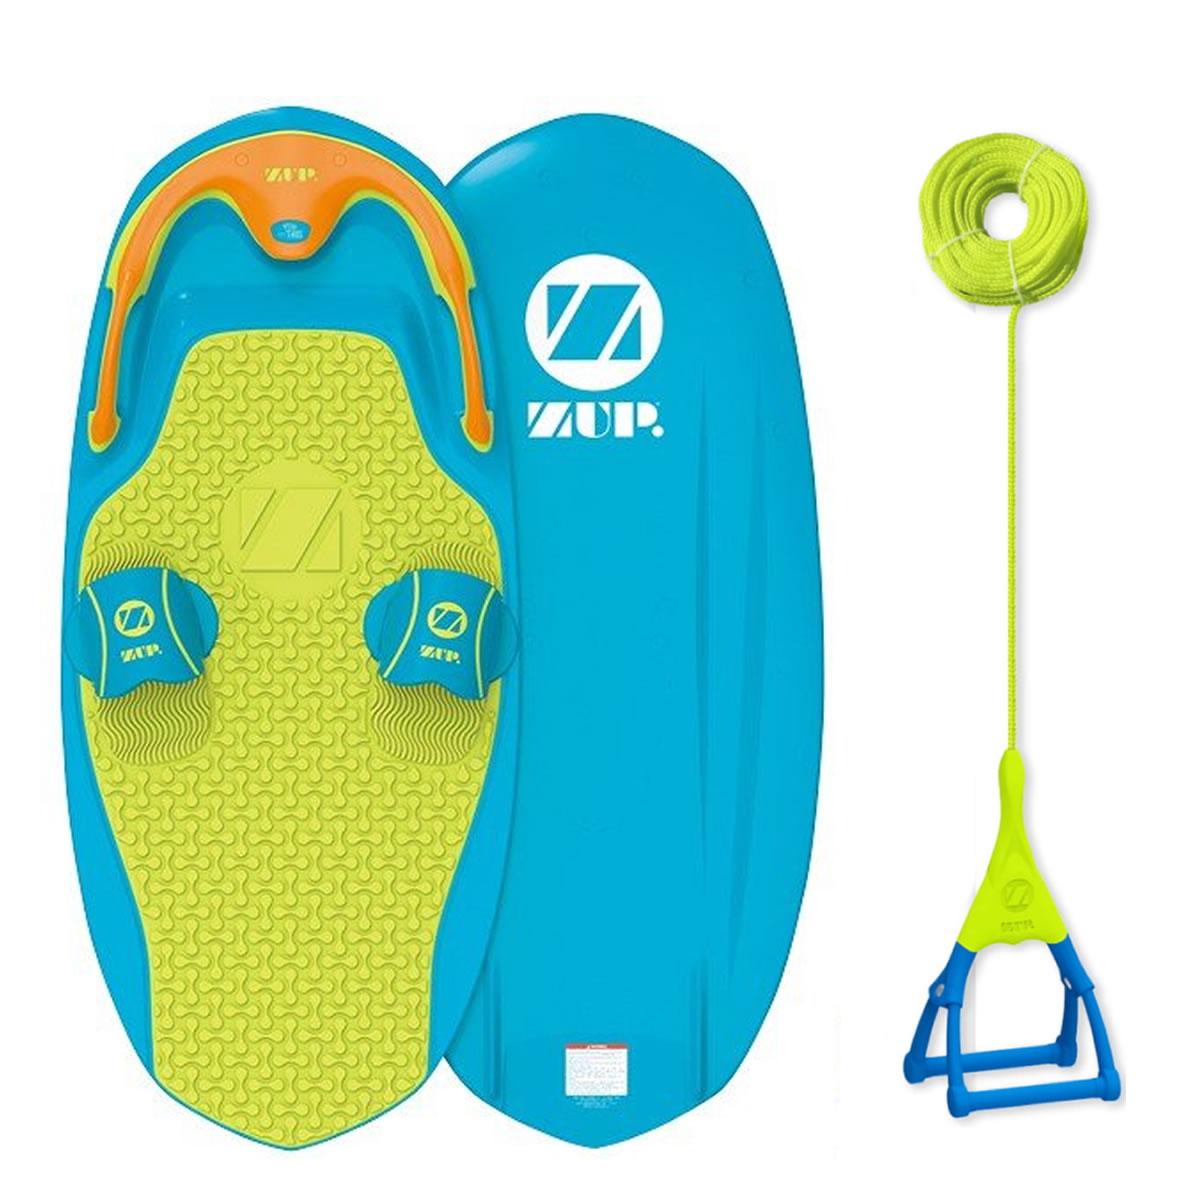 ZUP(ザップ)セット ボード2&ハンドル ブルー (43025)